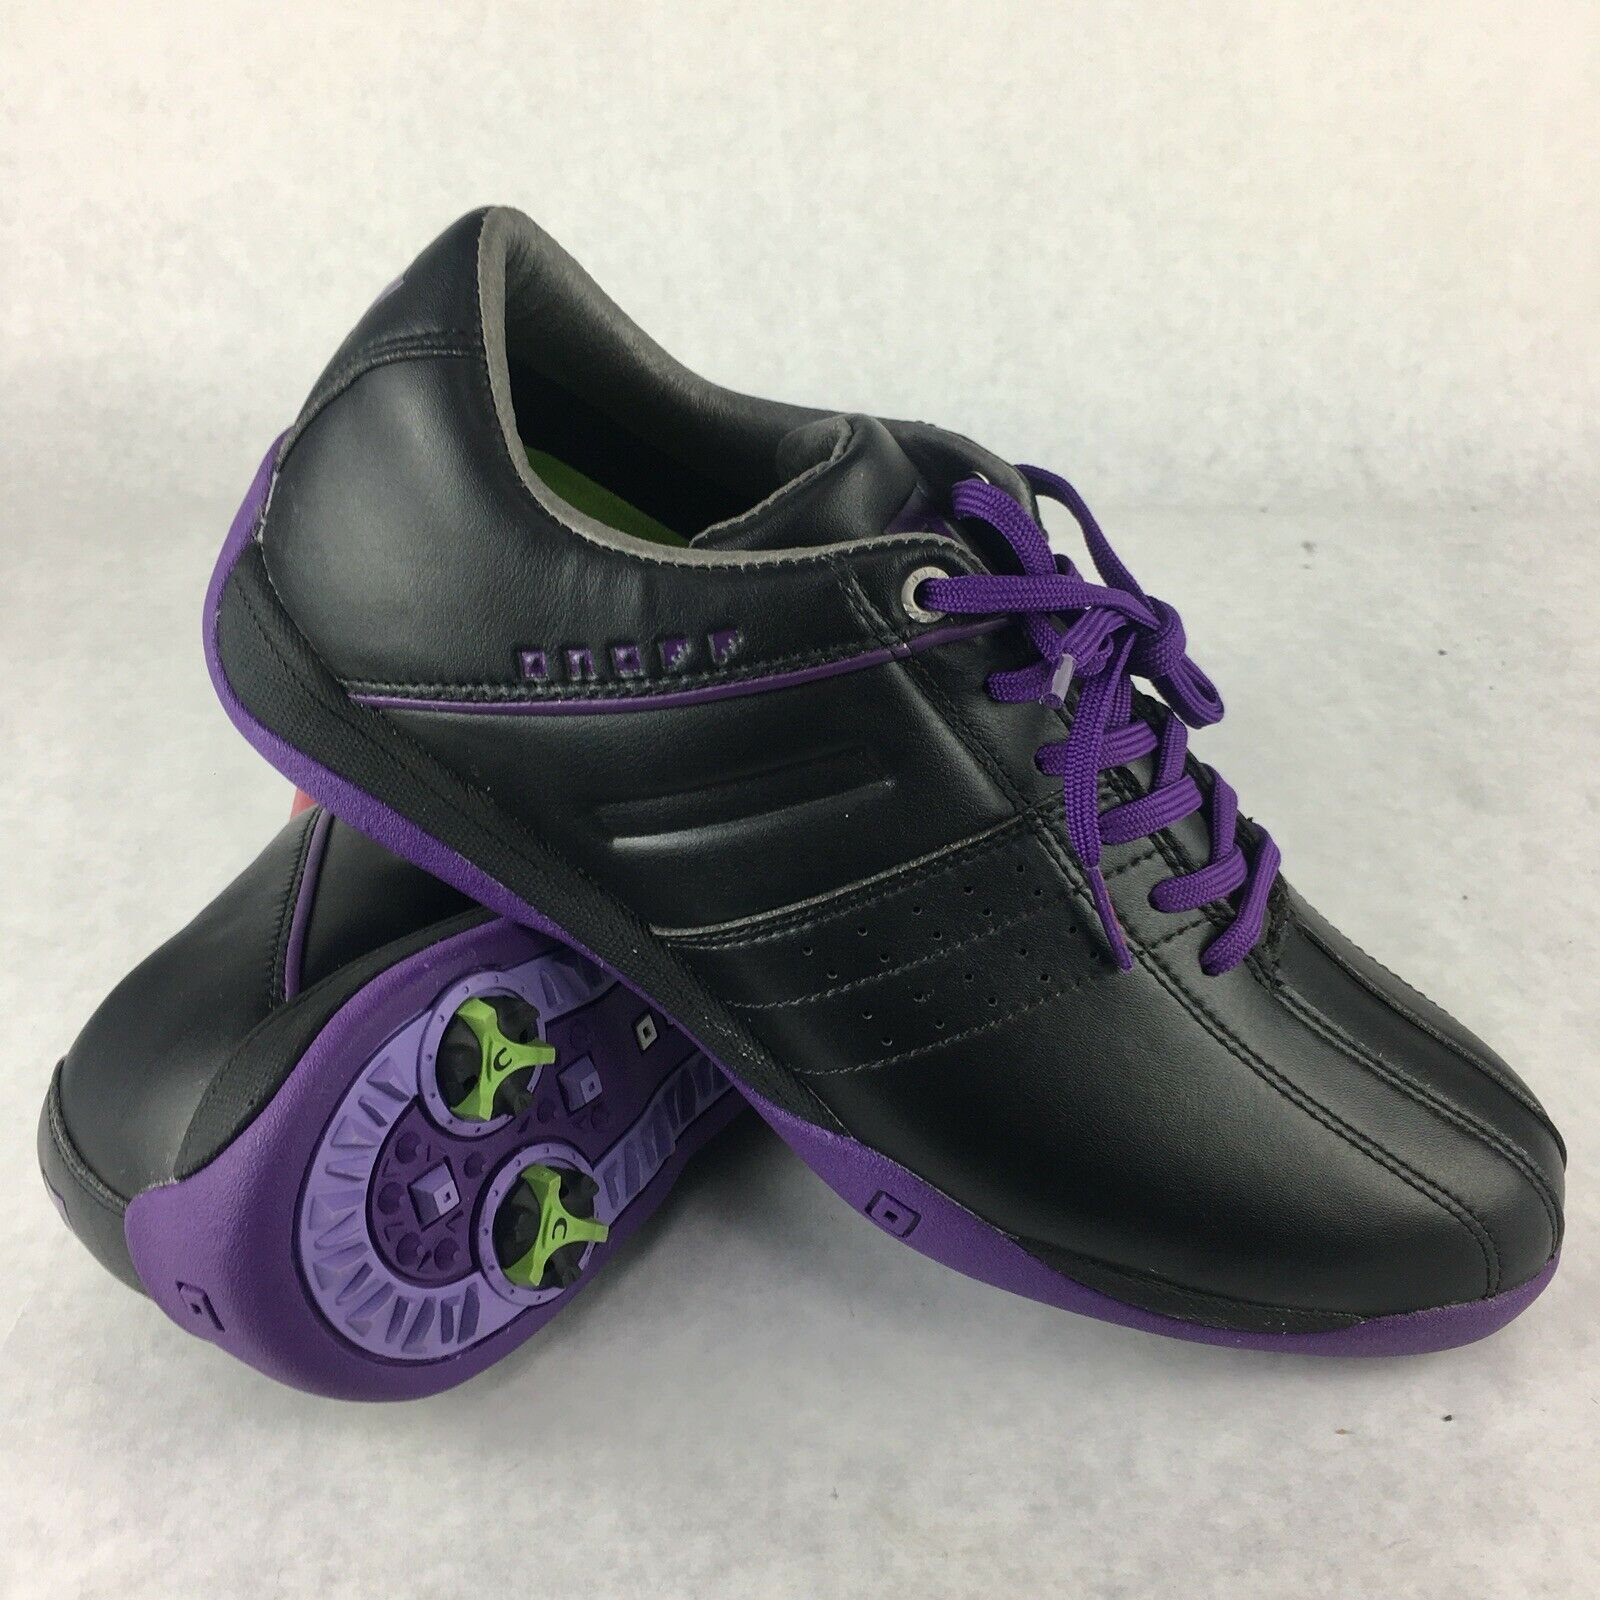 Onoff Zapatos De oro Modelo OS7114  Negro Púrpura Talla 24.5 EE. UU. Talla 8  Ahorre hasta un 70% de descuento.